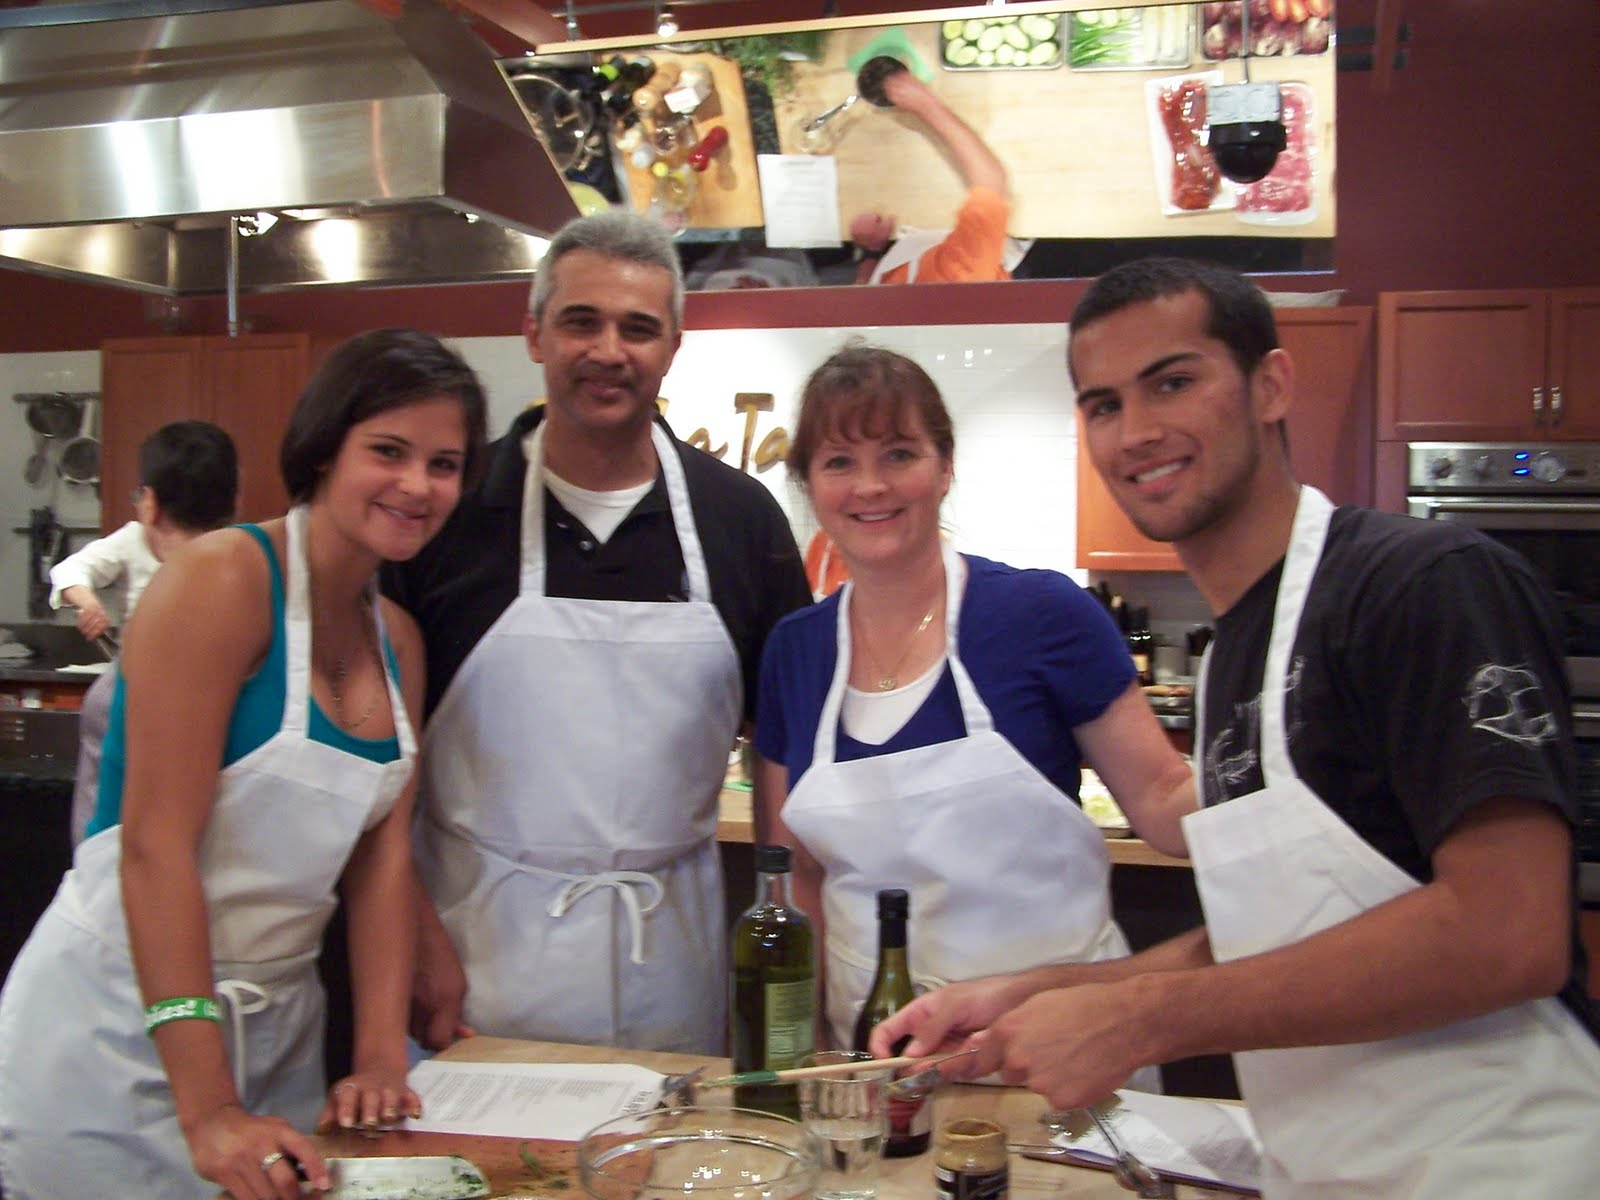 Pelican Cove Inn Sur La Table Cooking ClassesMake a Date of It